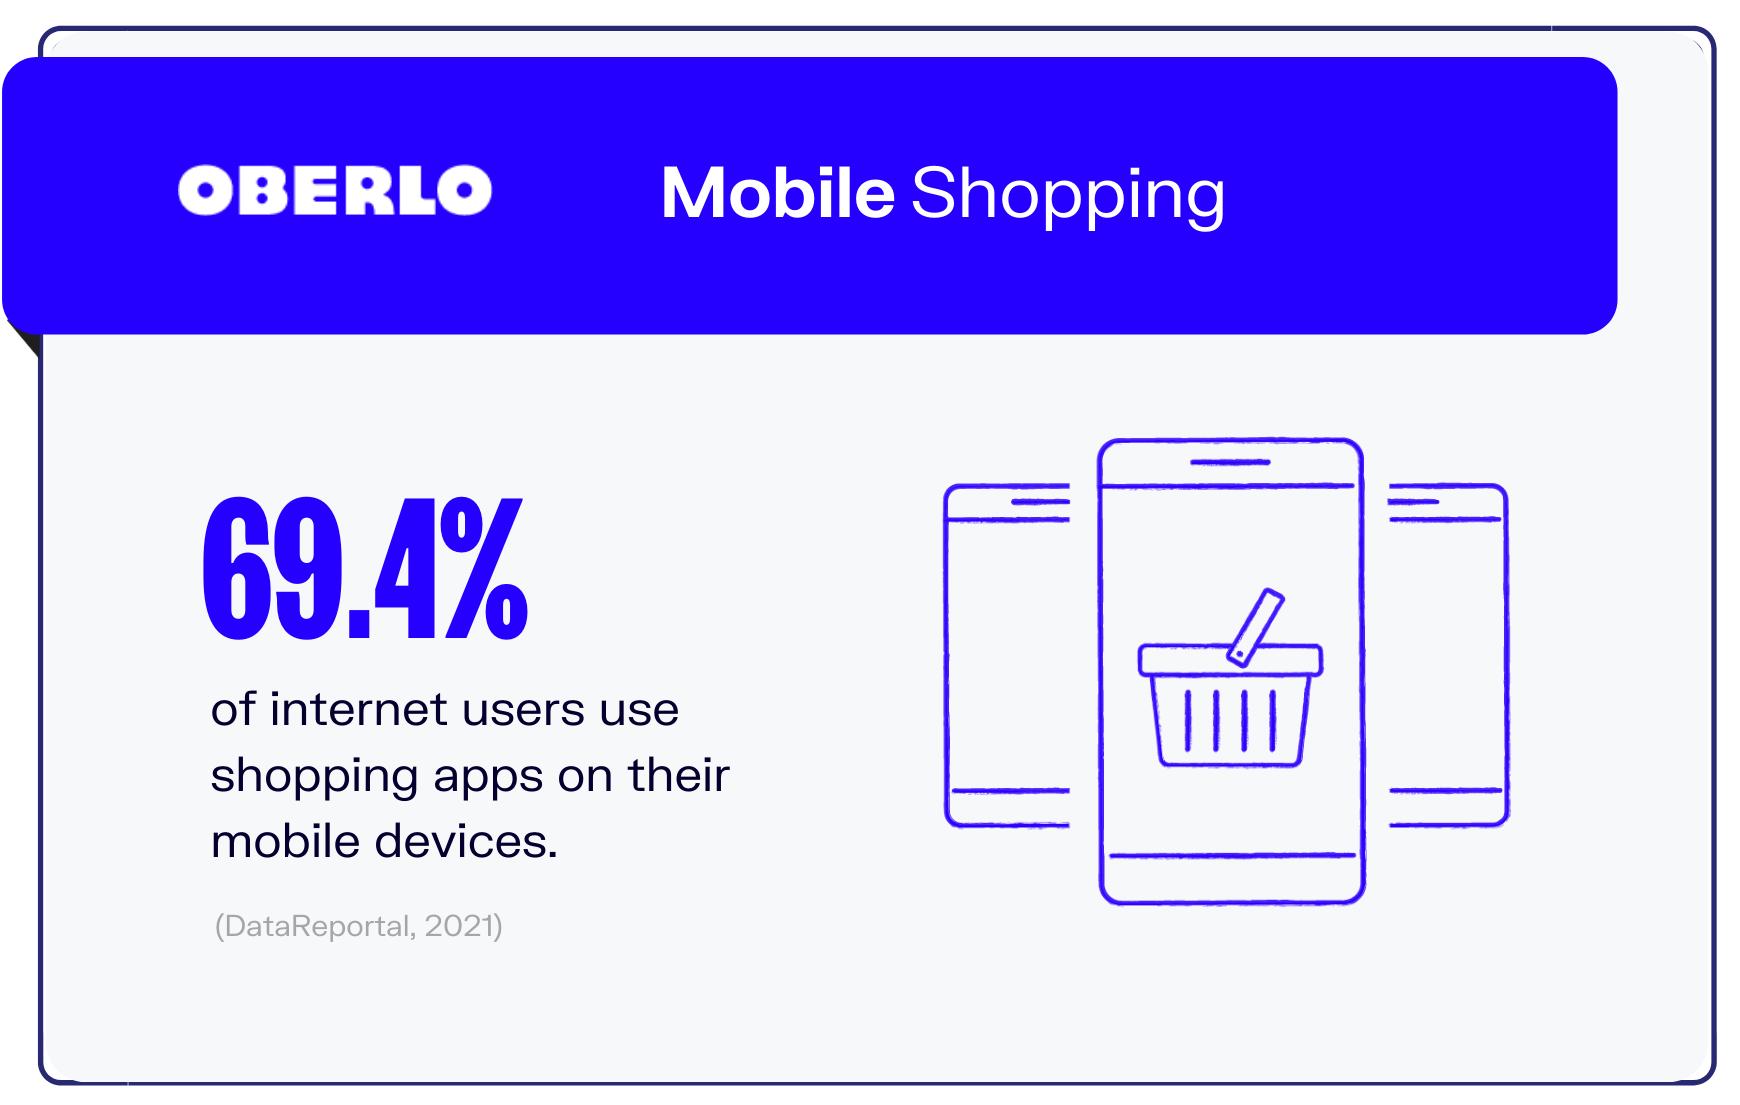 mobile usage statistics graphic 4